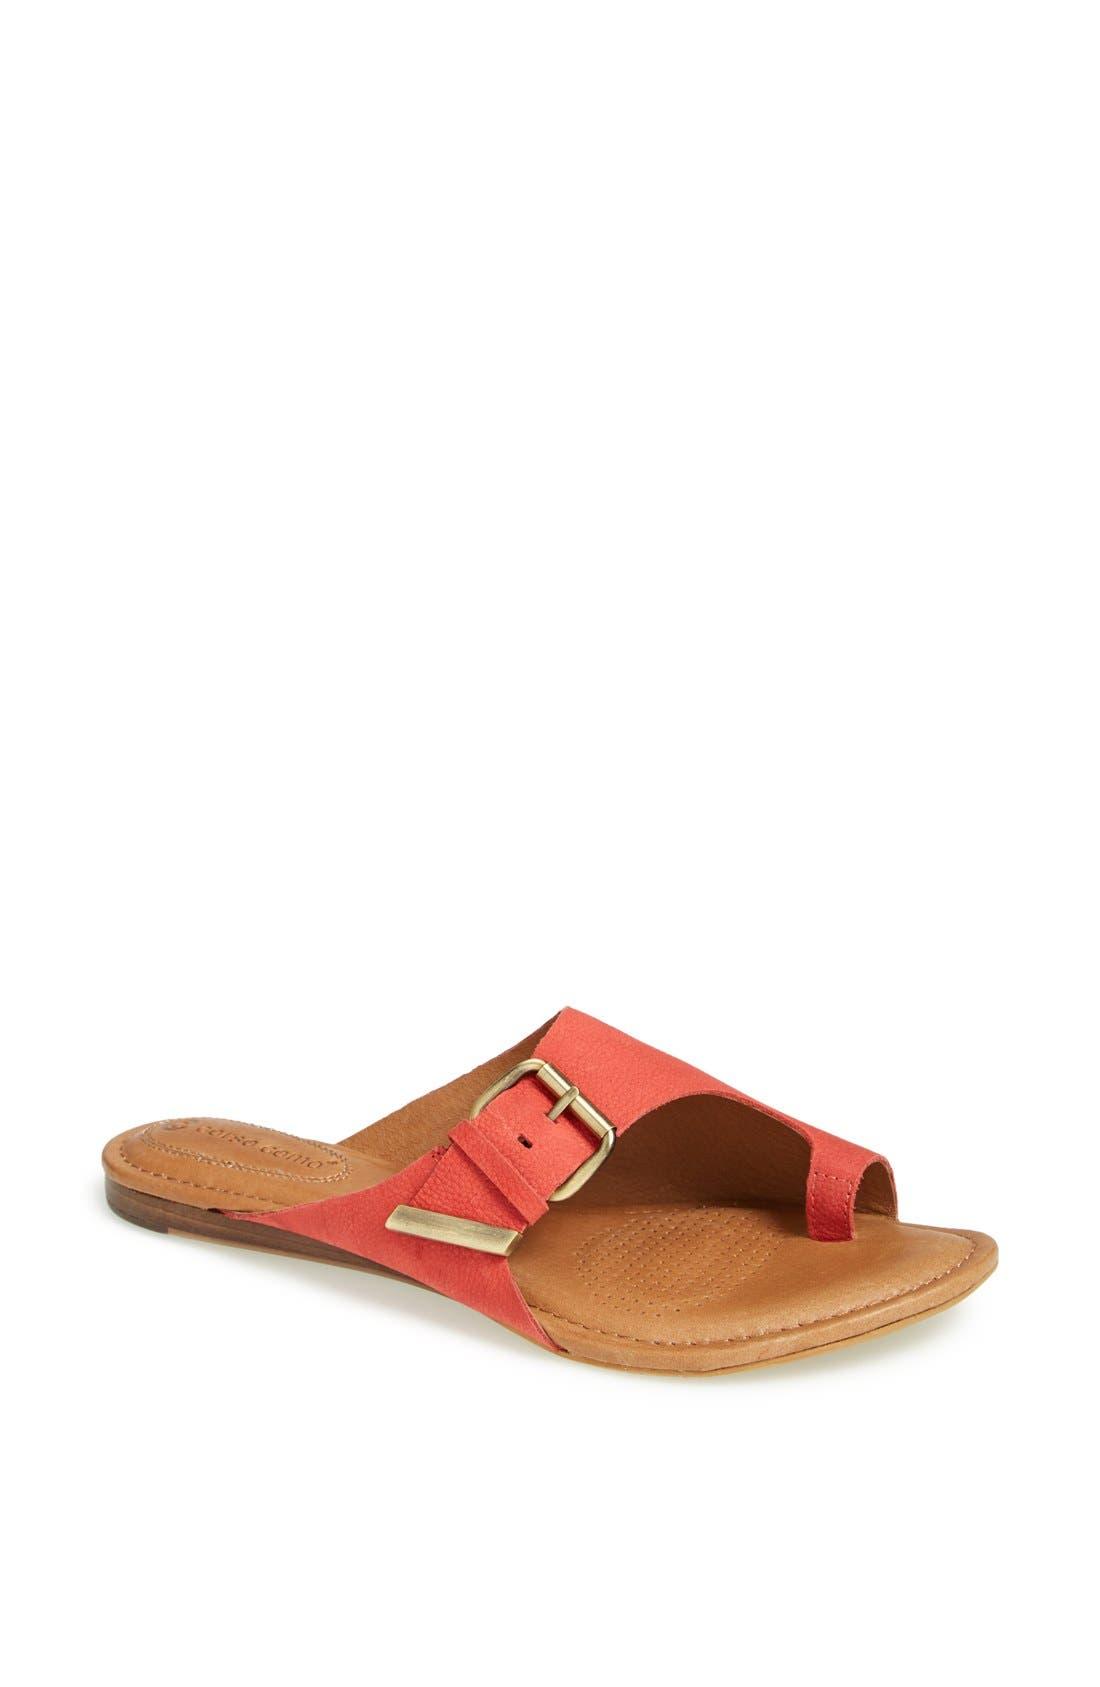 Main Image - Corso Como 'Slim' Sandal